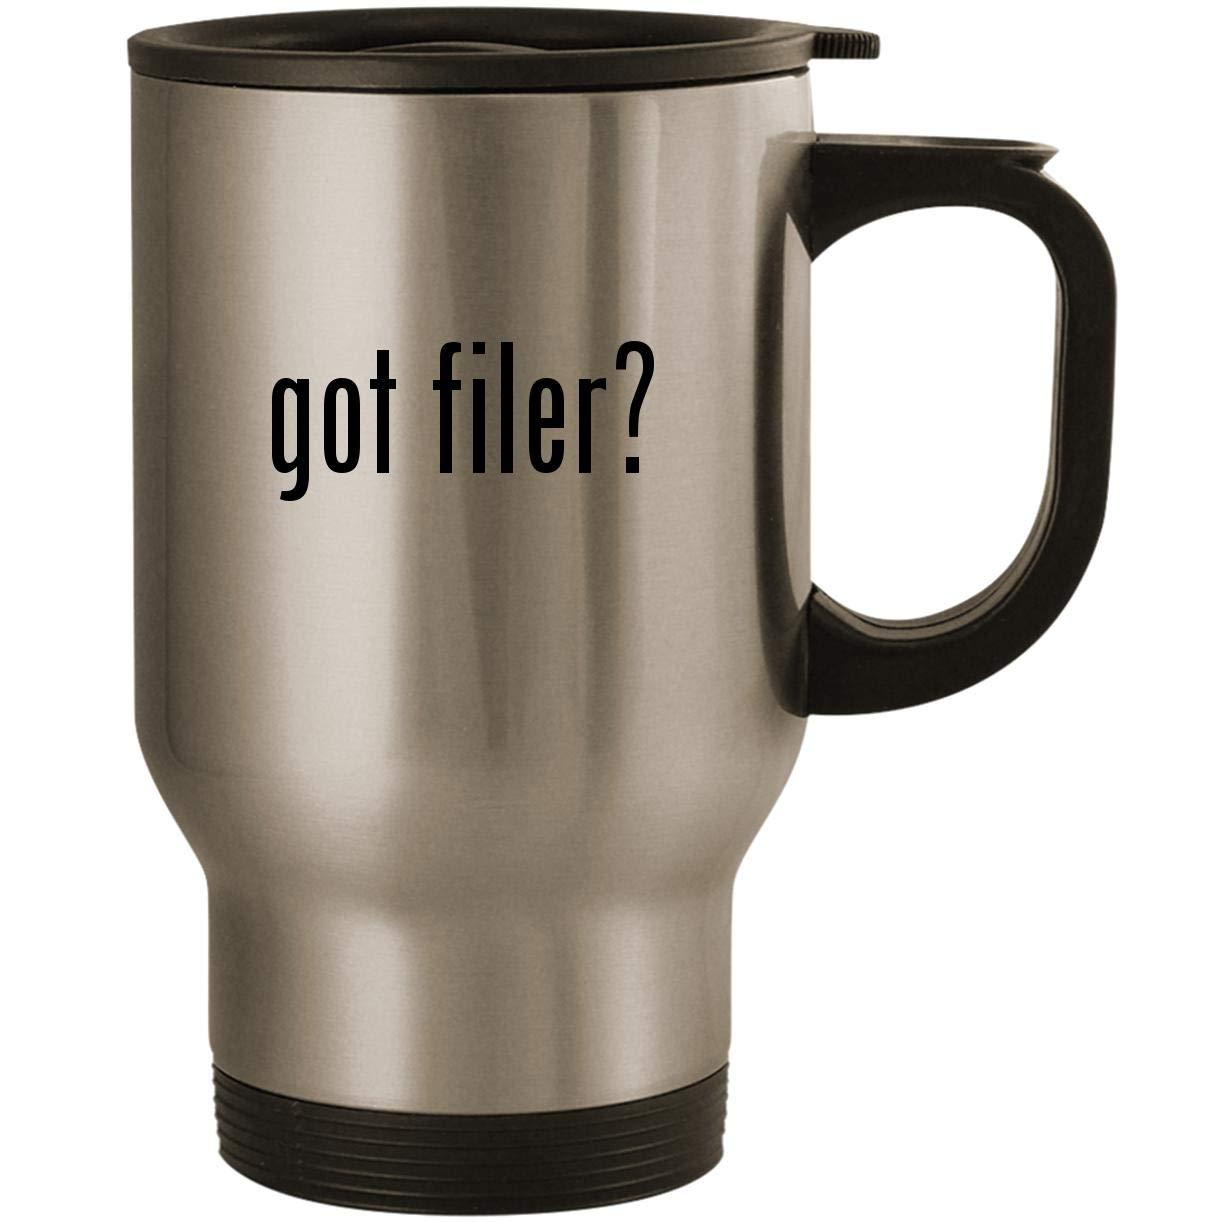 got filer? - Stainless Steel 14oz Road Ready Travel Mug, Silver